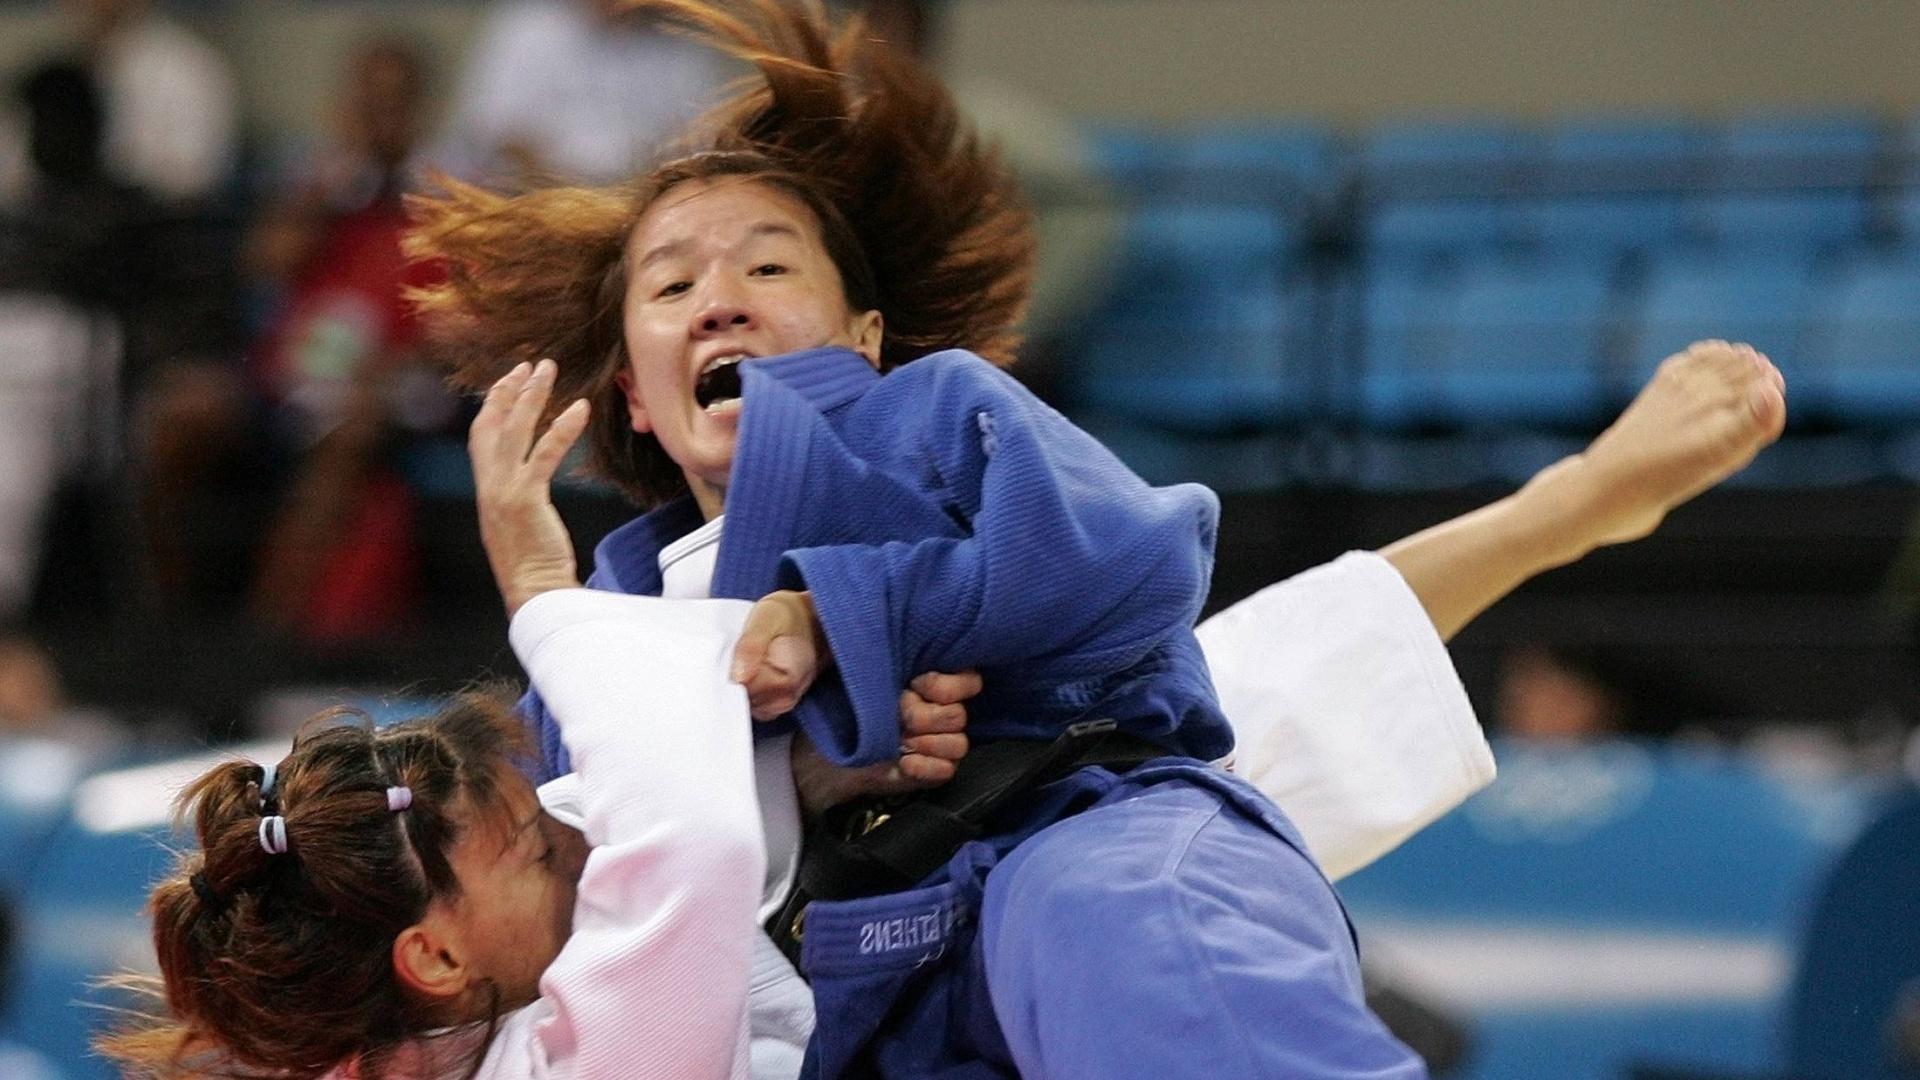 14.ago.2004 - Japonesa Ryoko Tamura Tani aplica um golpe na grega Maria Karagiannopoulou na final do judô na Olimpíada de Atenas